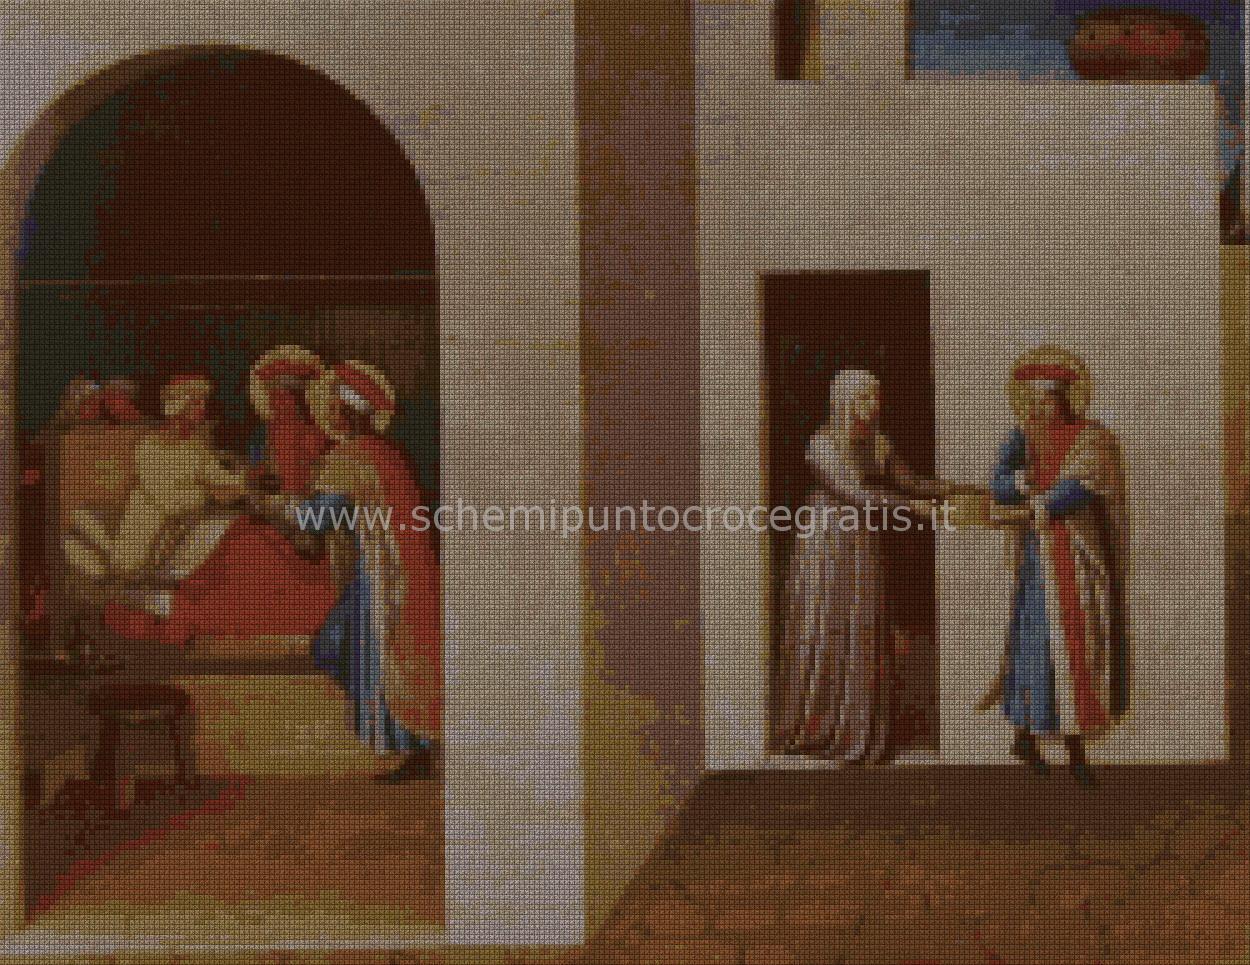 pittori_classici/beatoangelico/beato_angelico_04s.jpg